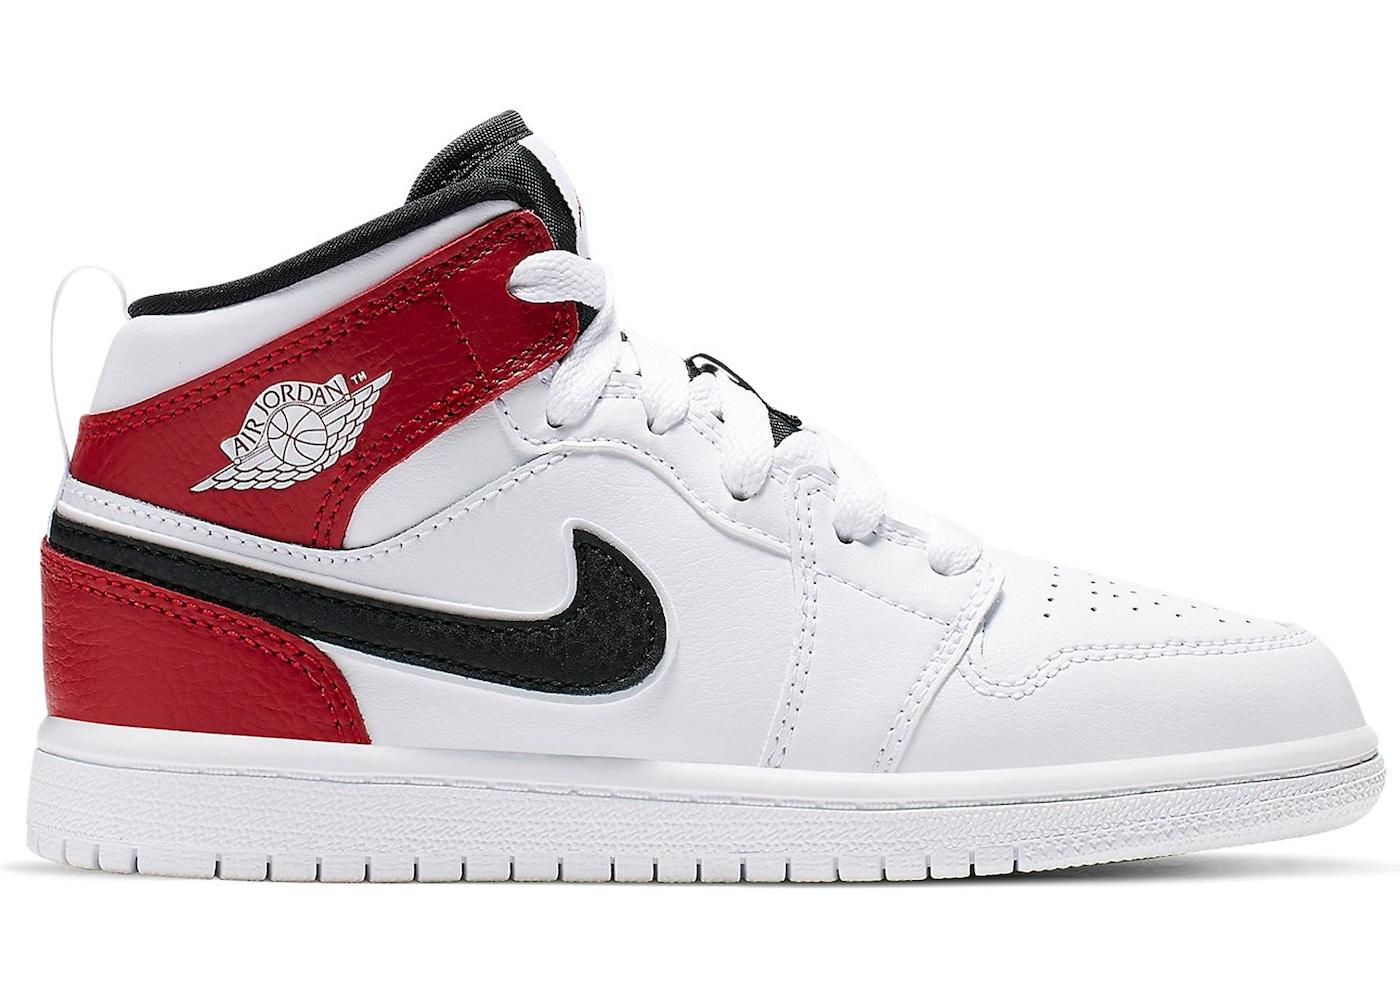 Jordan 1 Mid White Black Gym Red (PS)